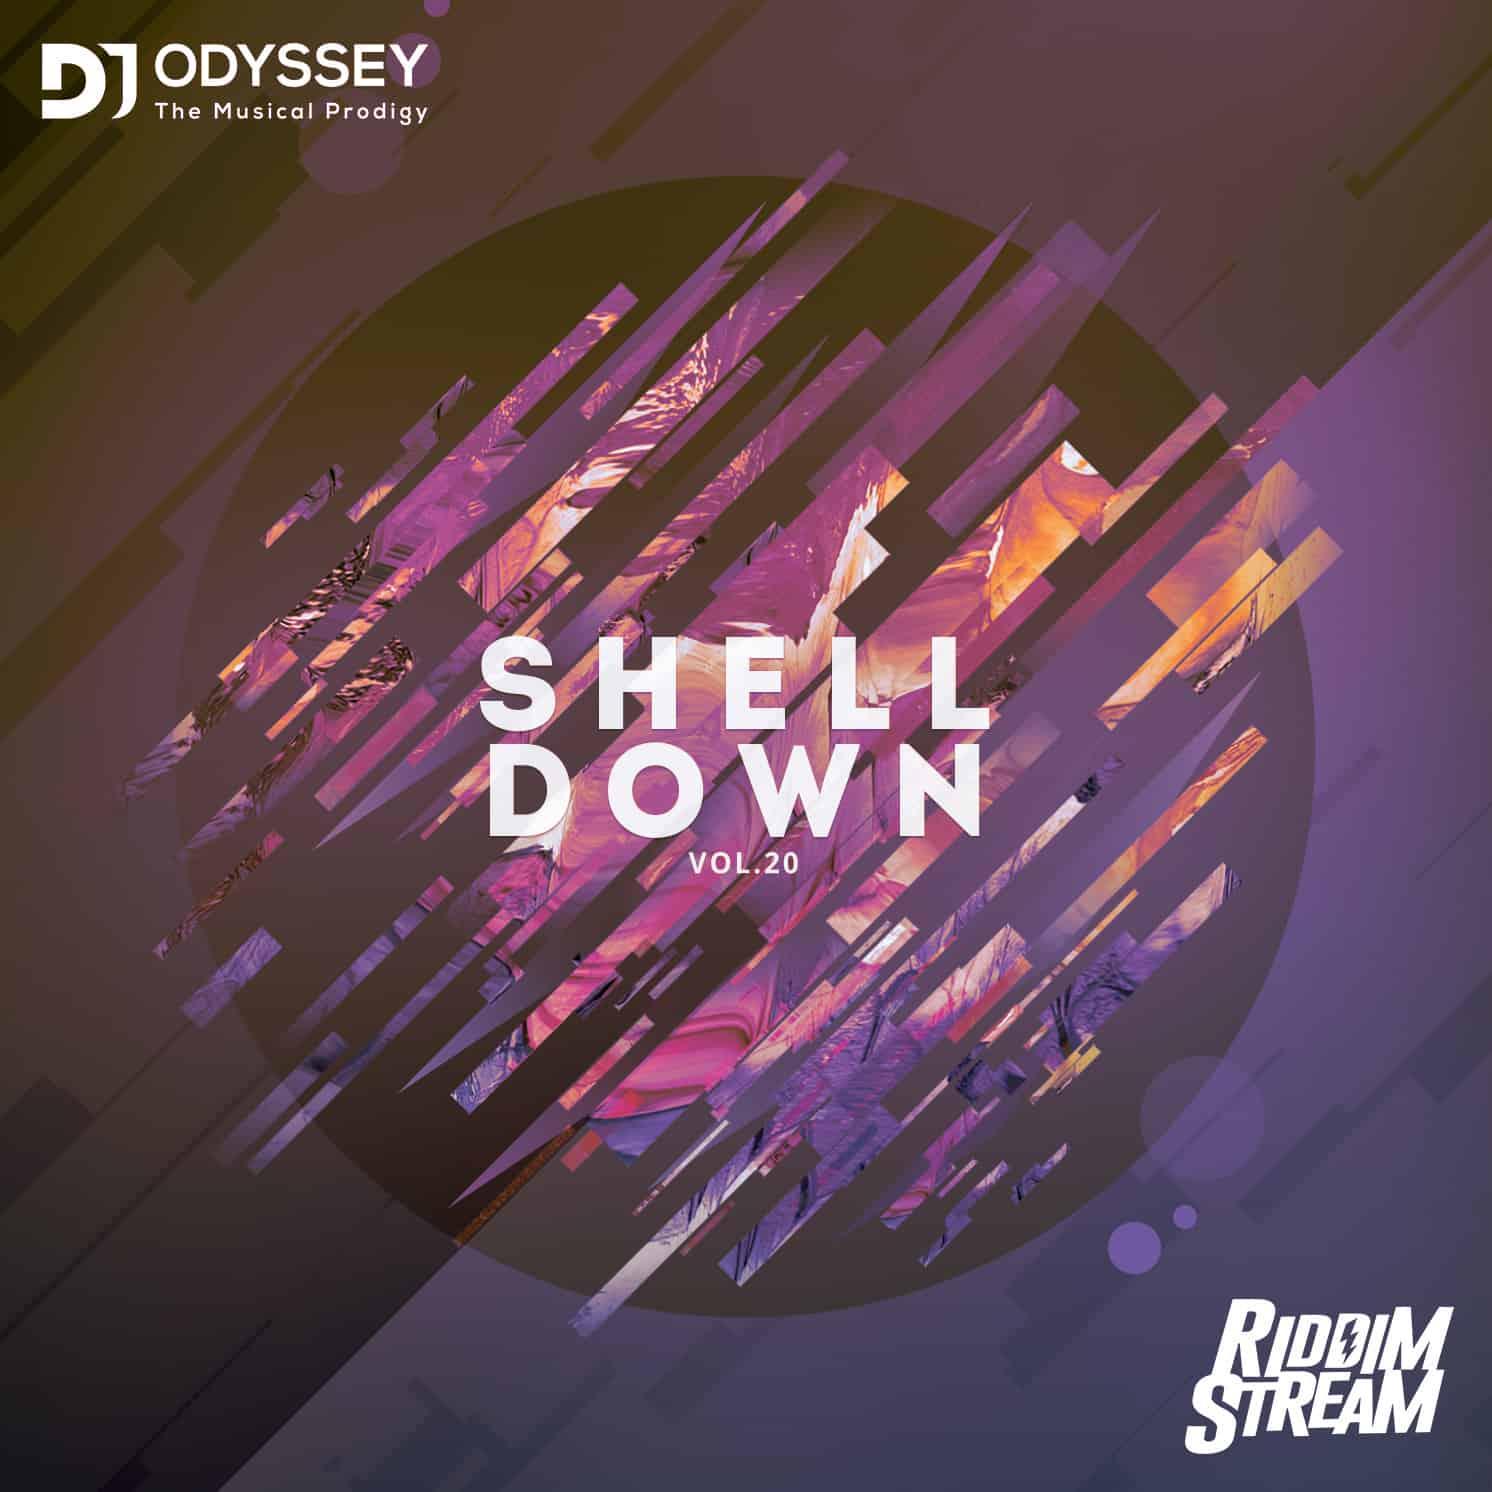 DJ Odyssey - Shell Down Vol. 20